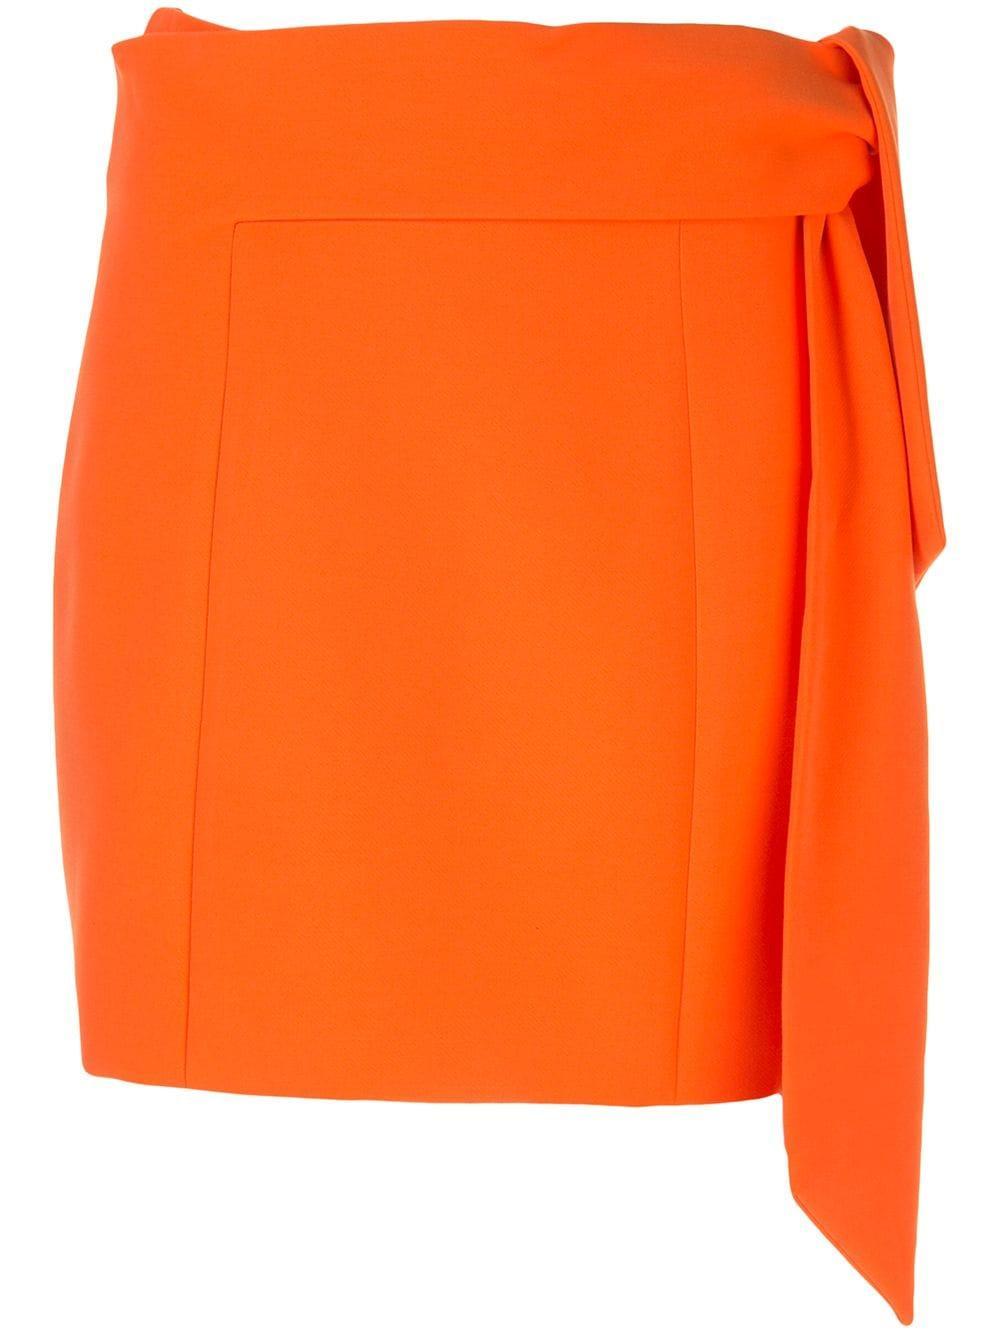 Riva Mini Skirt With Tie Item # CC002213302